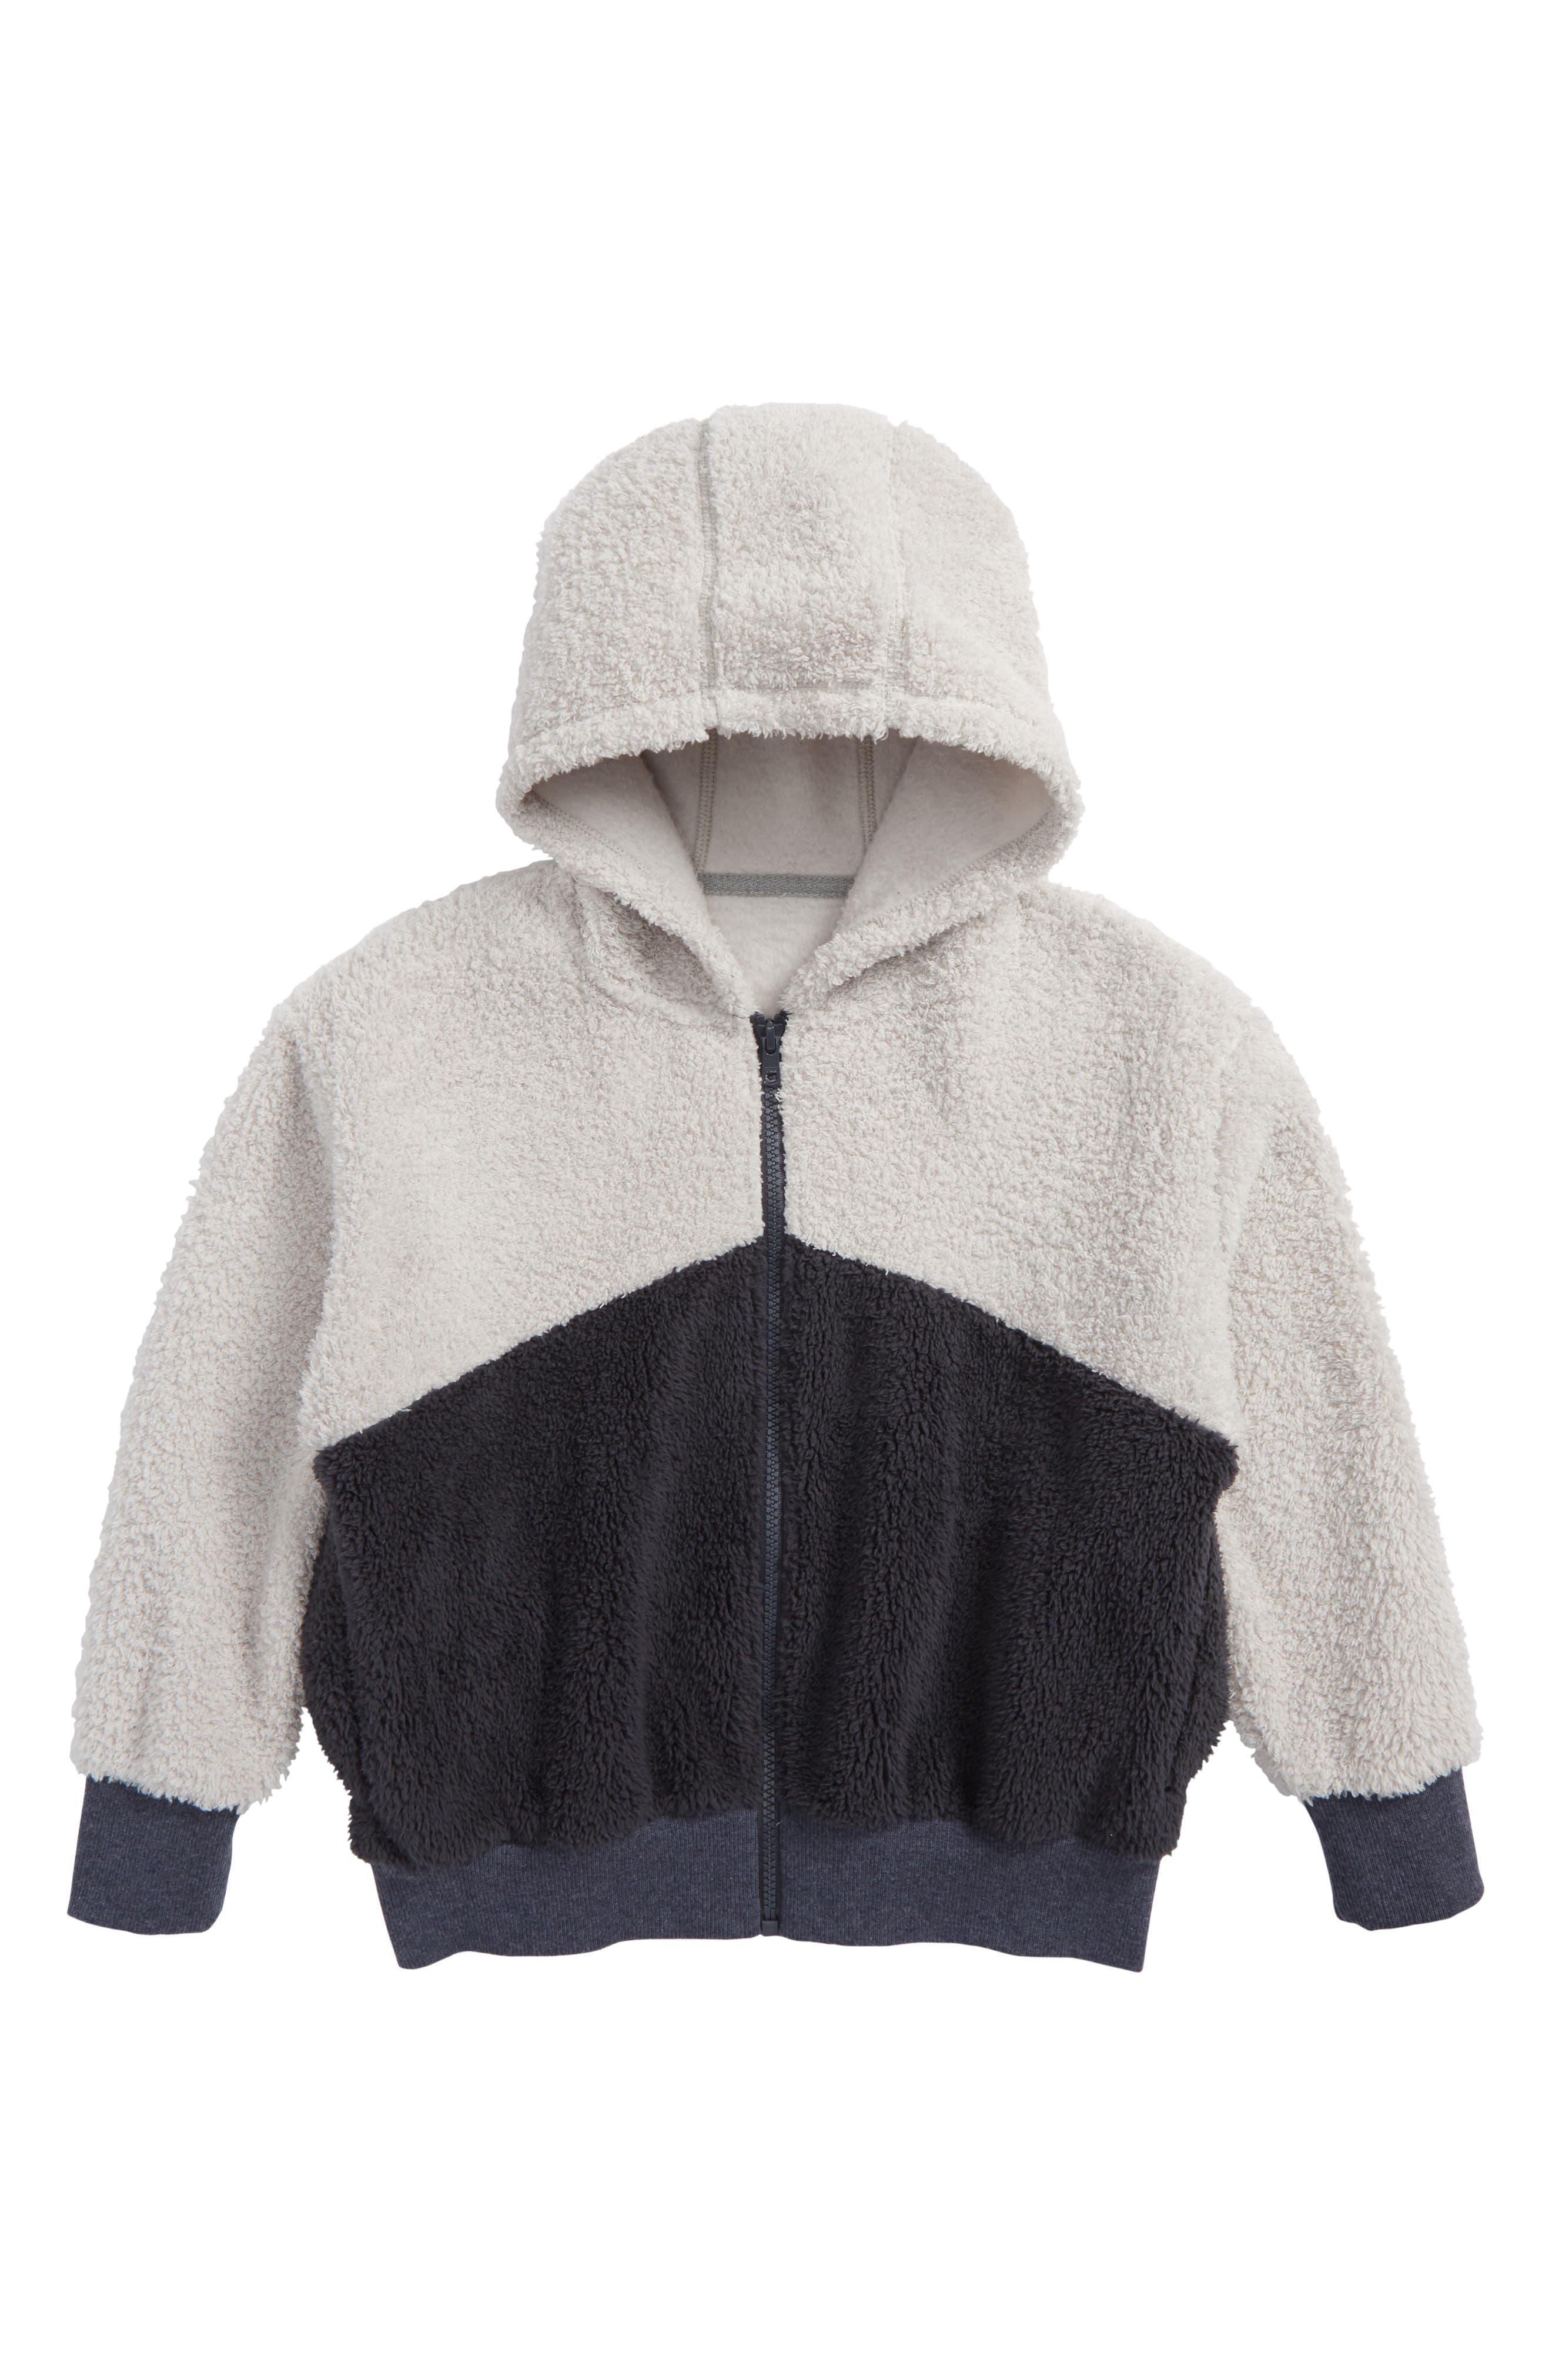 Two-Tone Hooded Jacket,                             Main thumbnail 1, color,